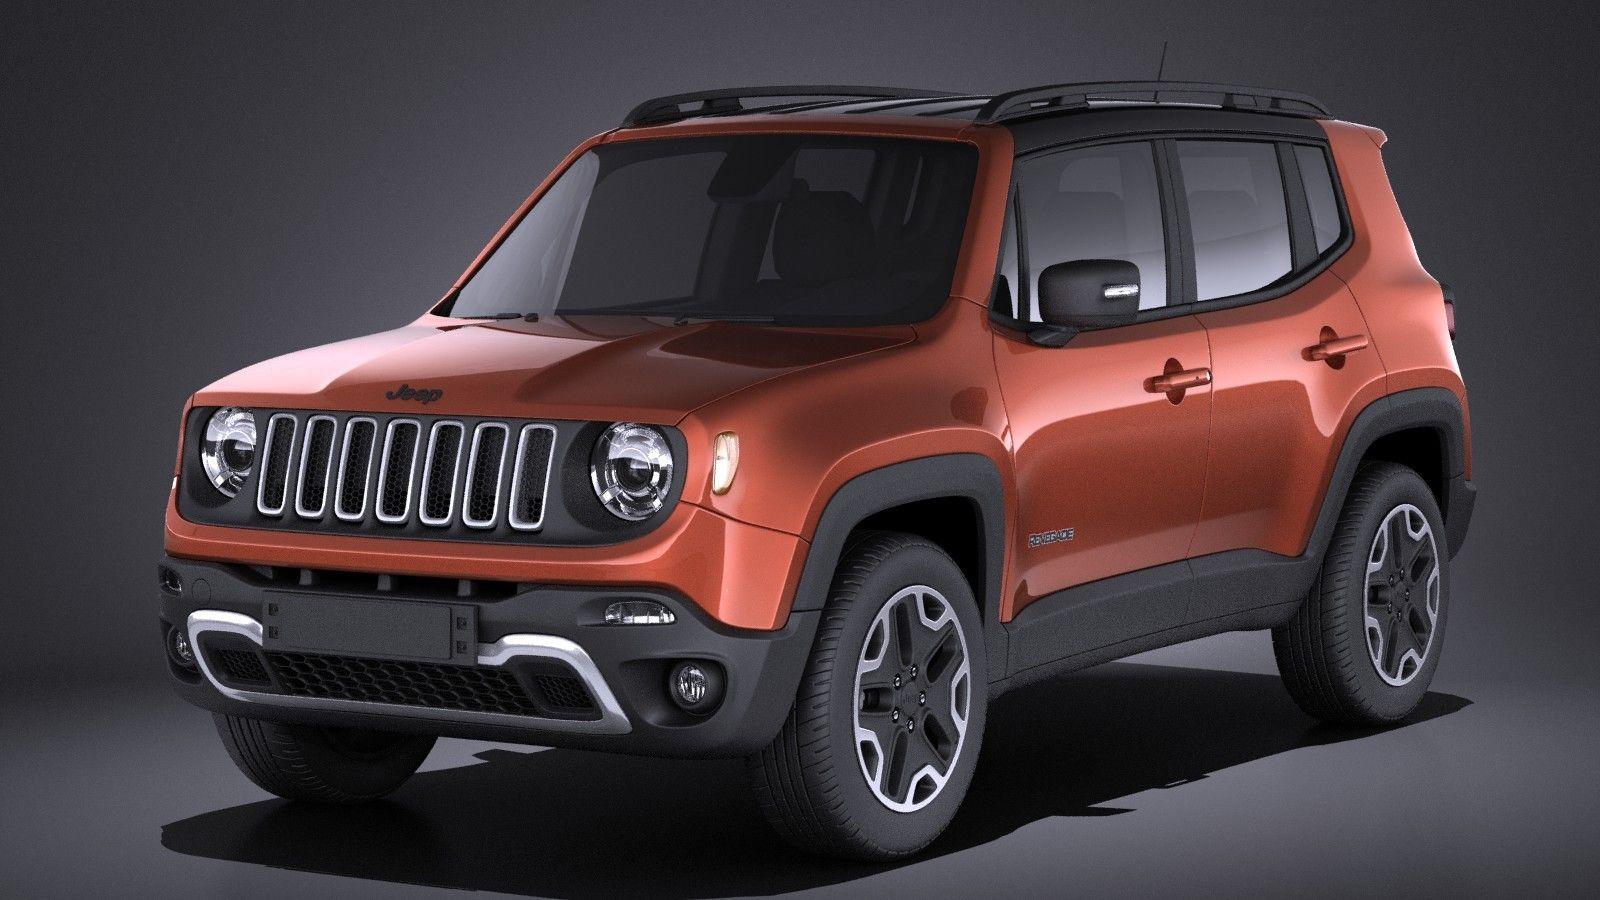 3d model 2017 jeep renegade Jeep renegade, Jeep renegade